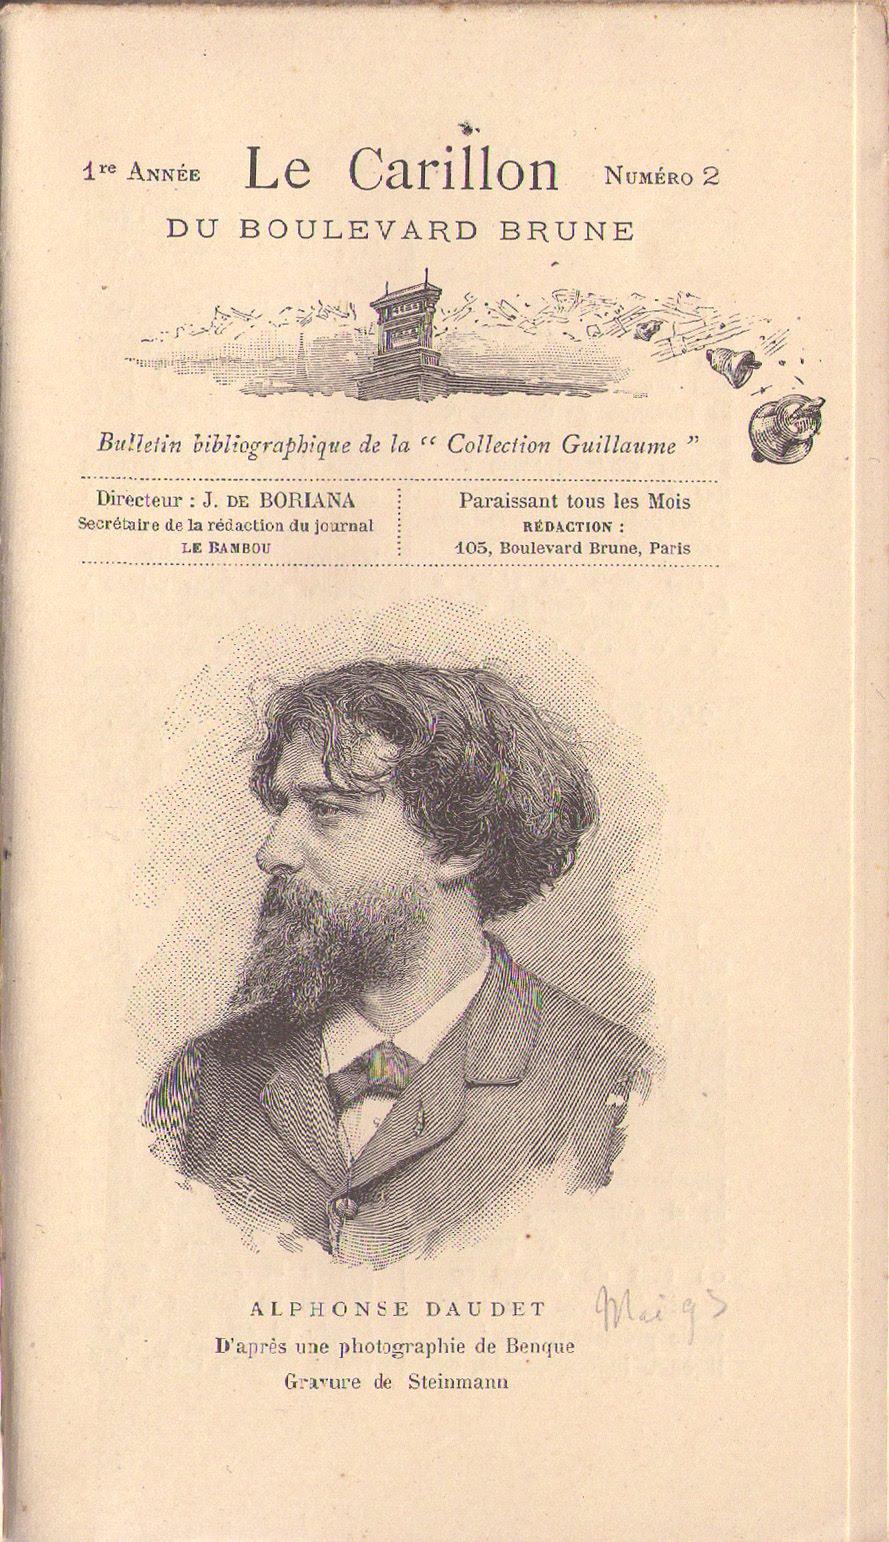 CORRESPONDANCE - Alphonse Daudet,Edmond de Goncourt